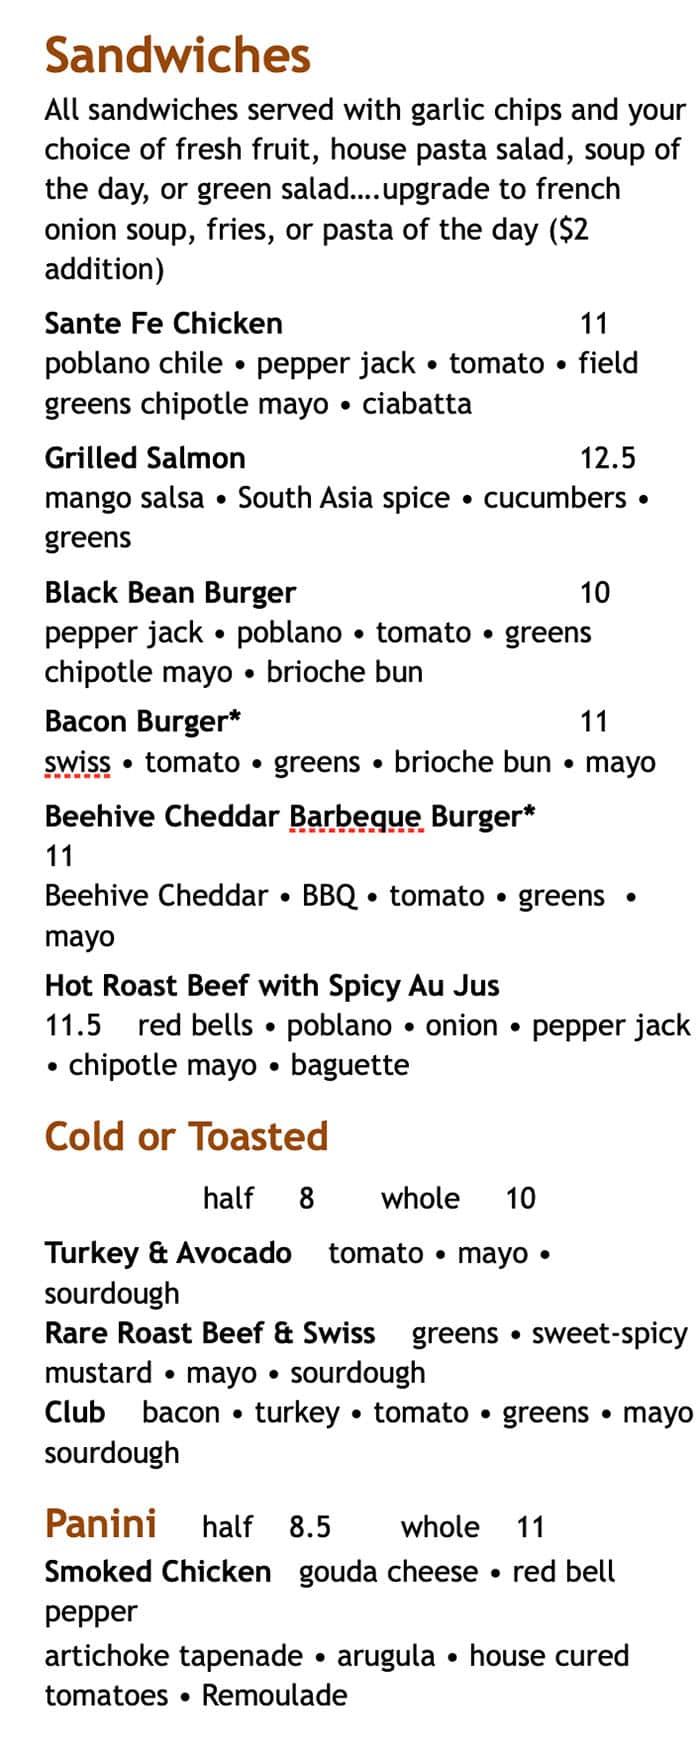 Martine Cafe lunch menu - sandwiches